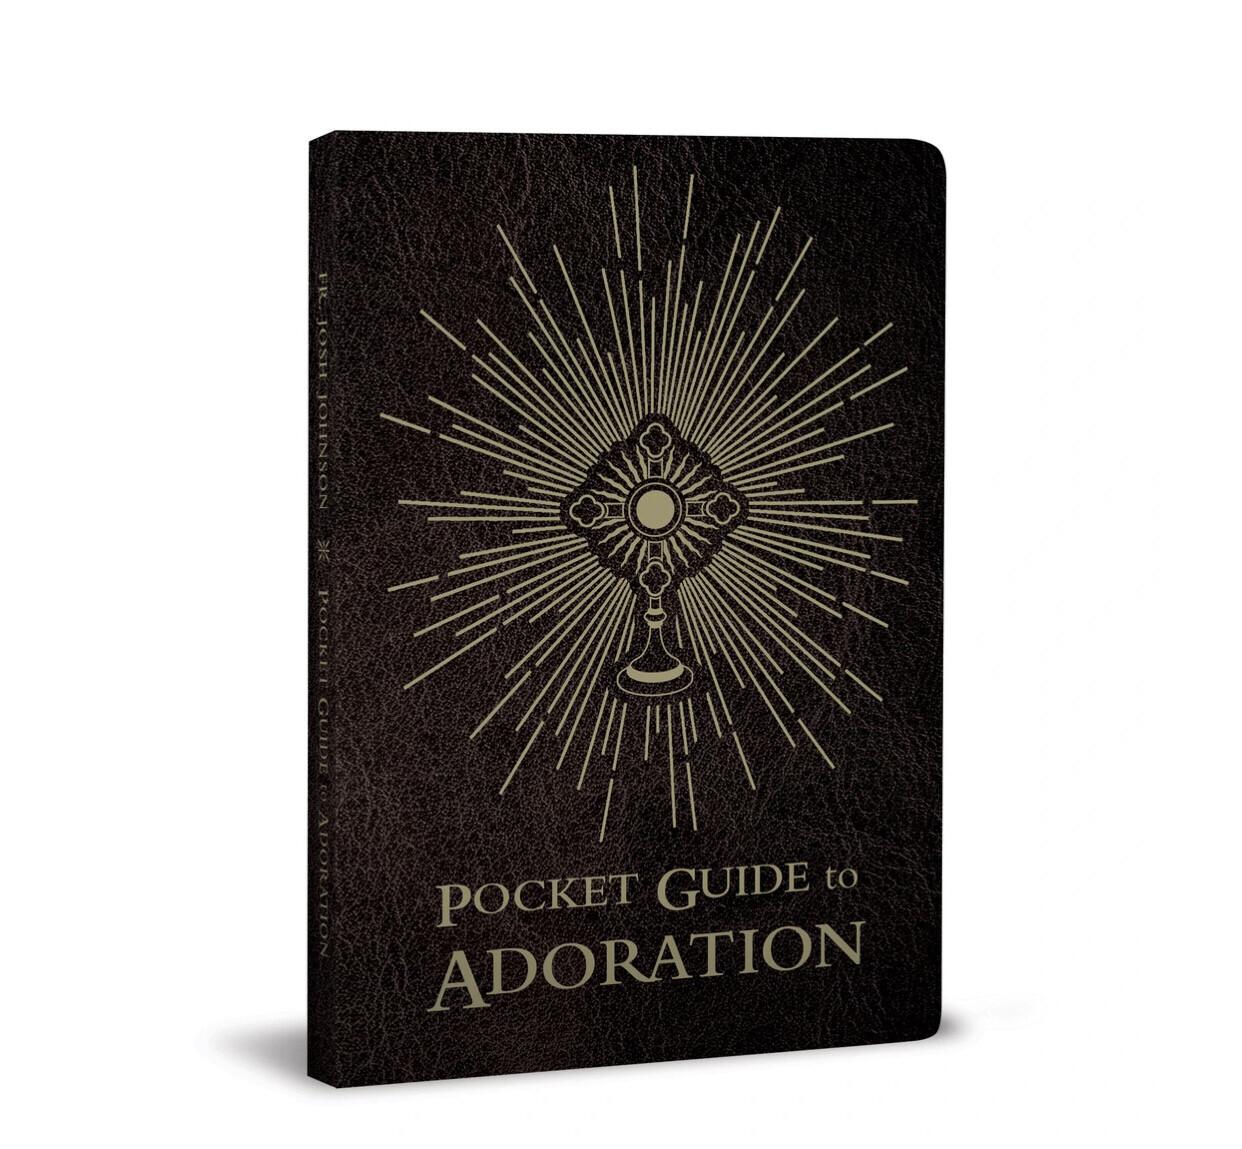 Pocket Guide to Adoration